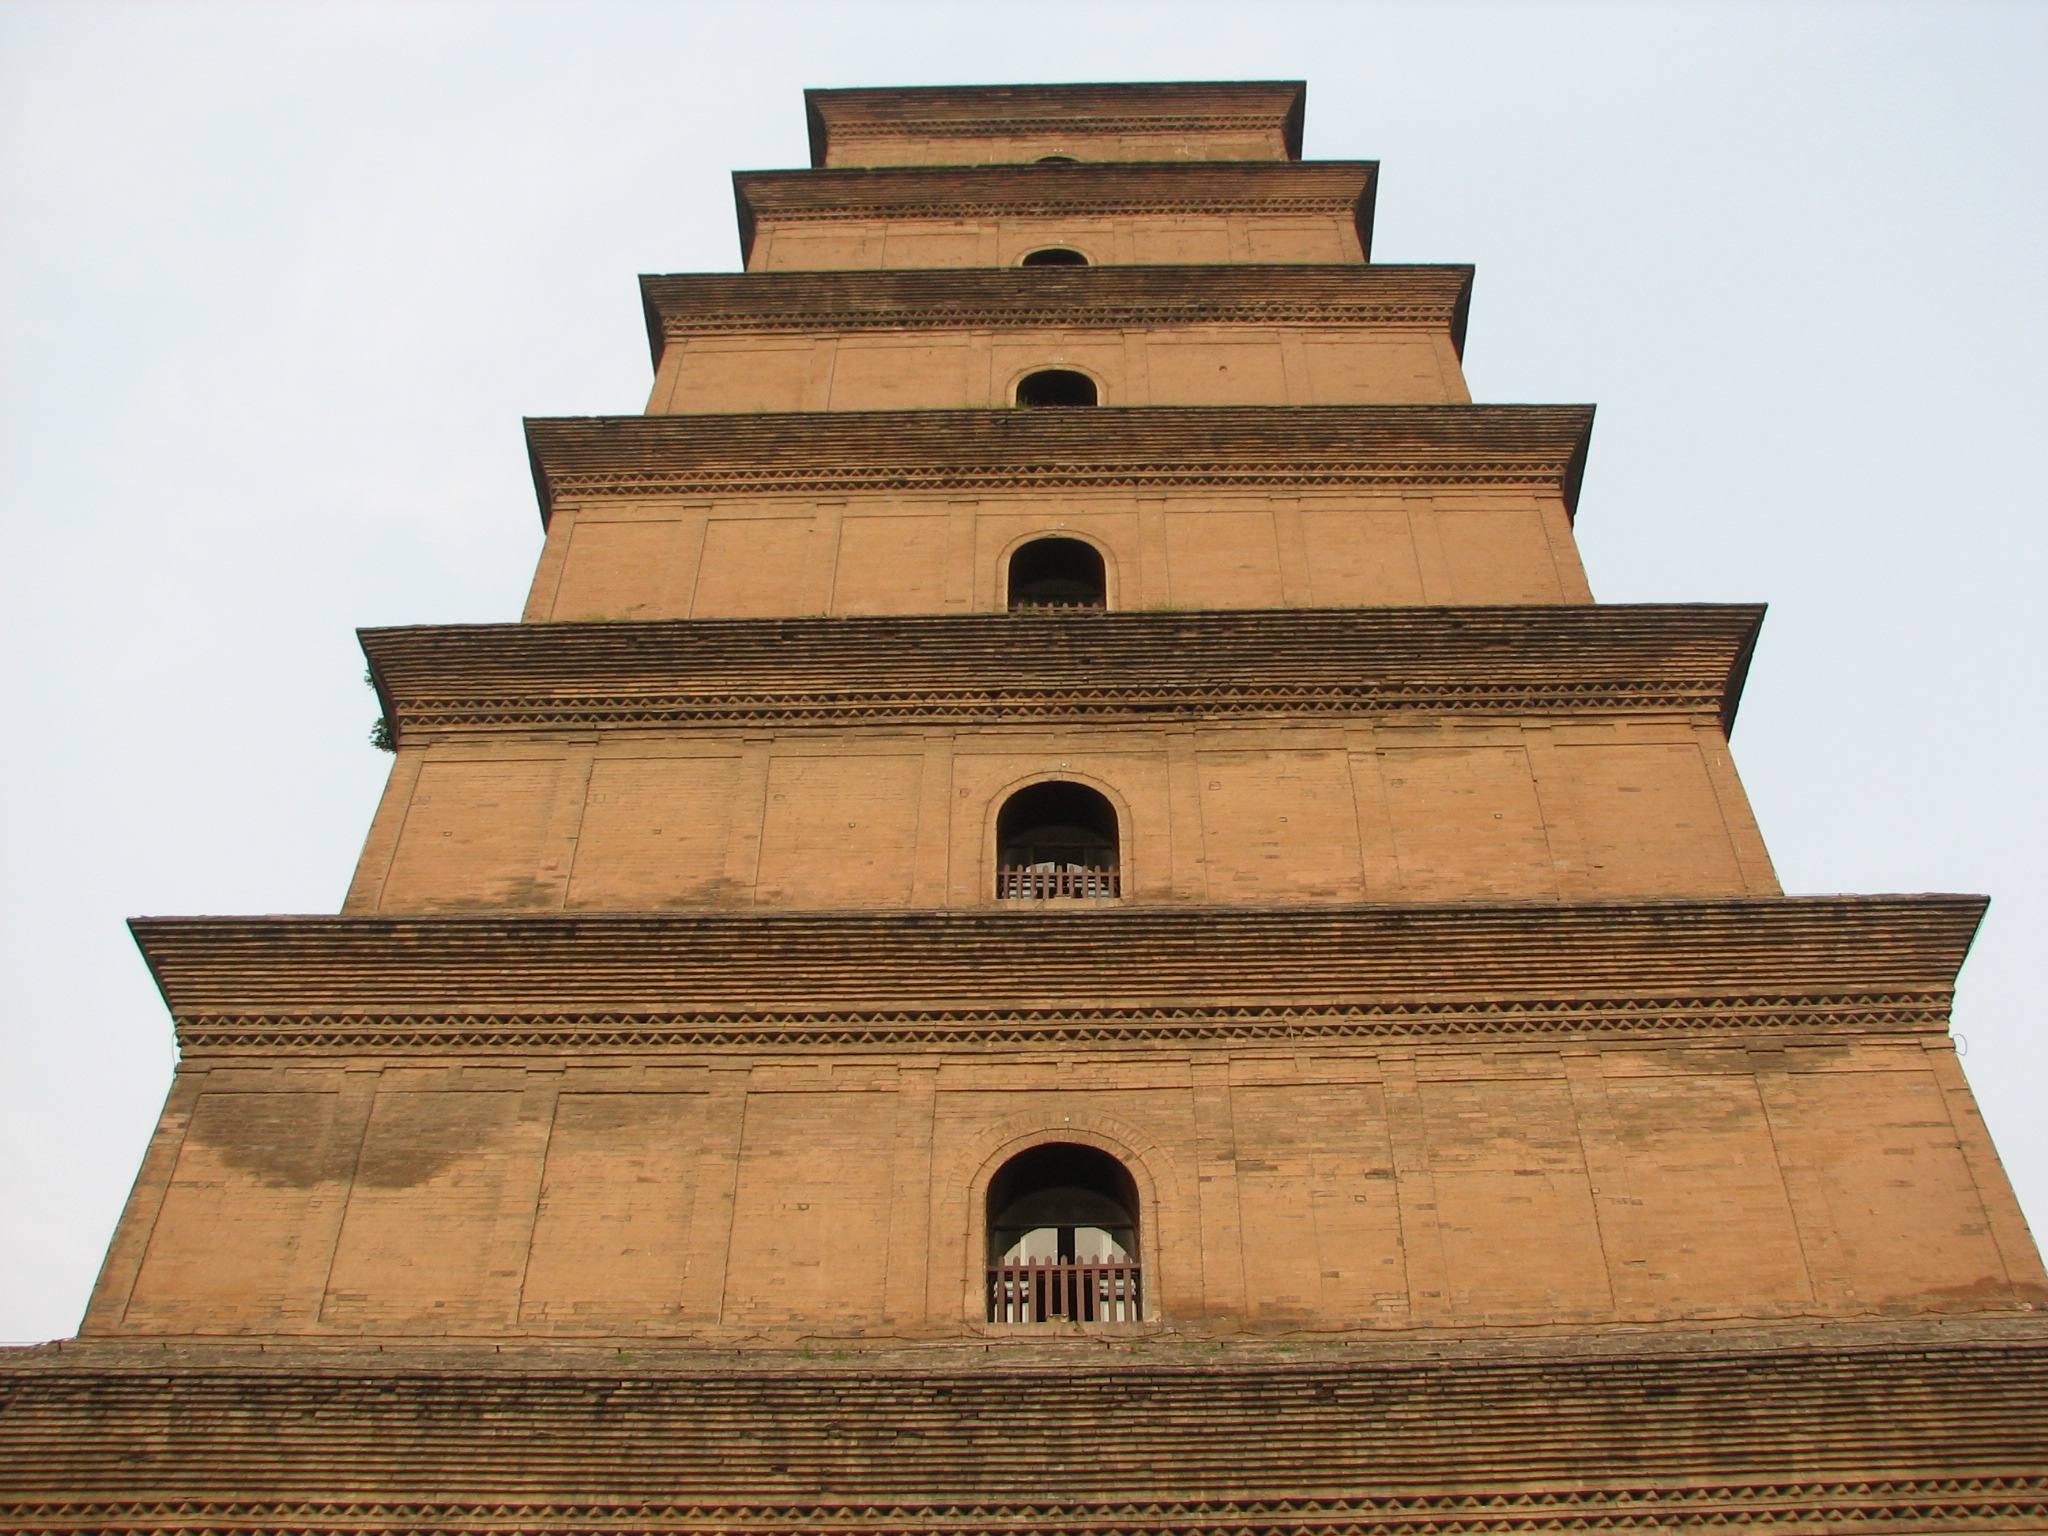 Big_Wild_Goose_Pagoda.jpg